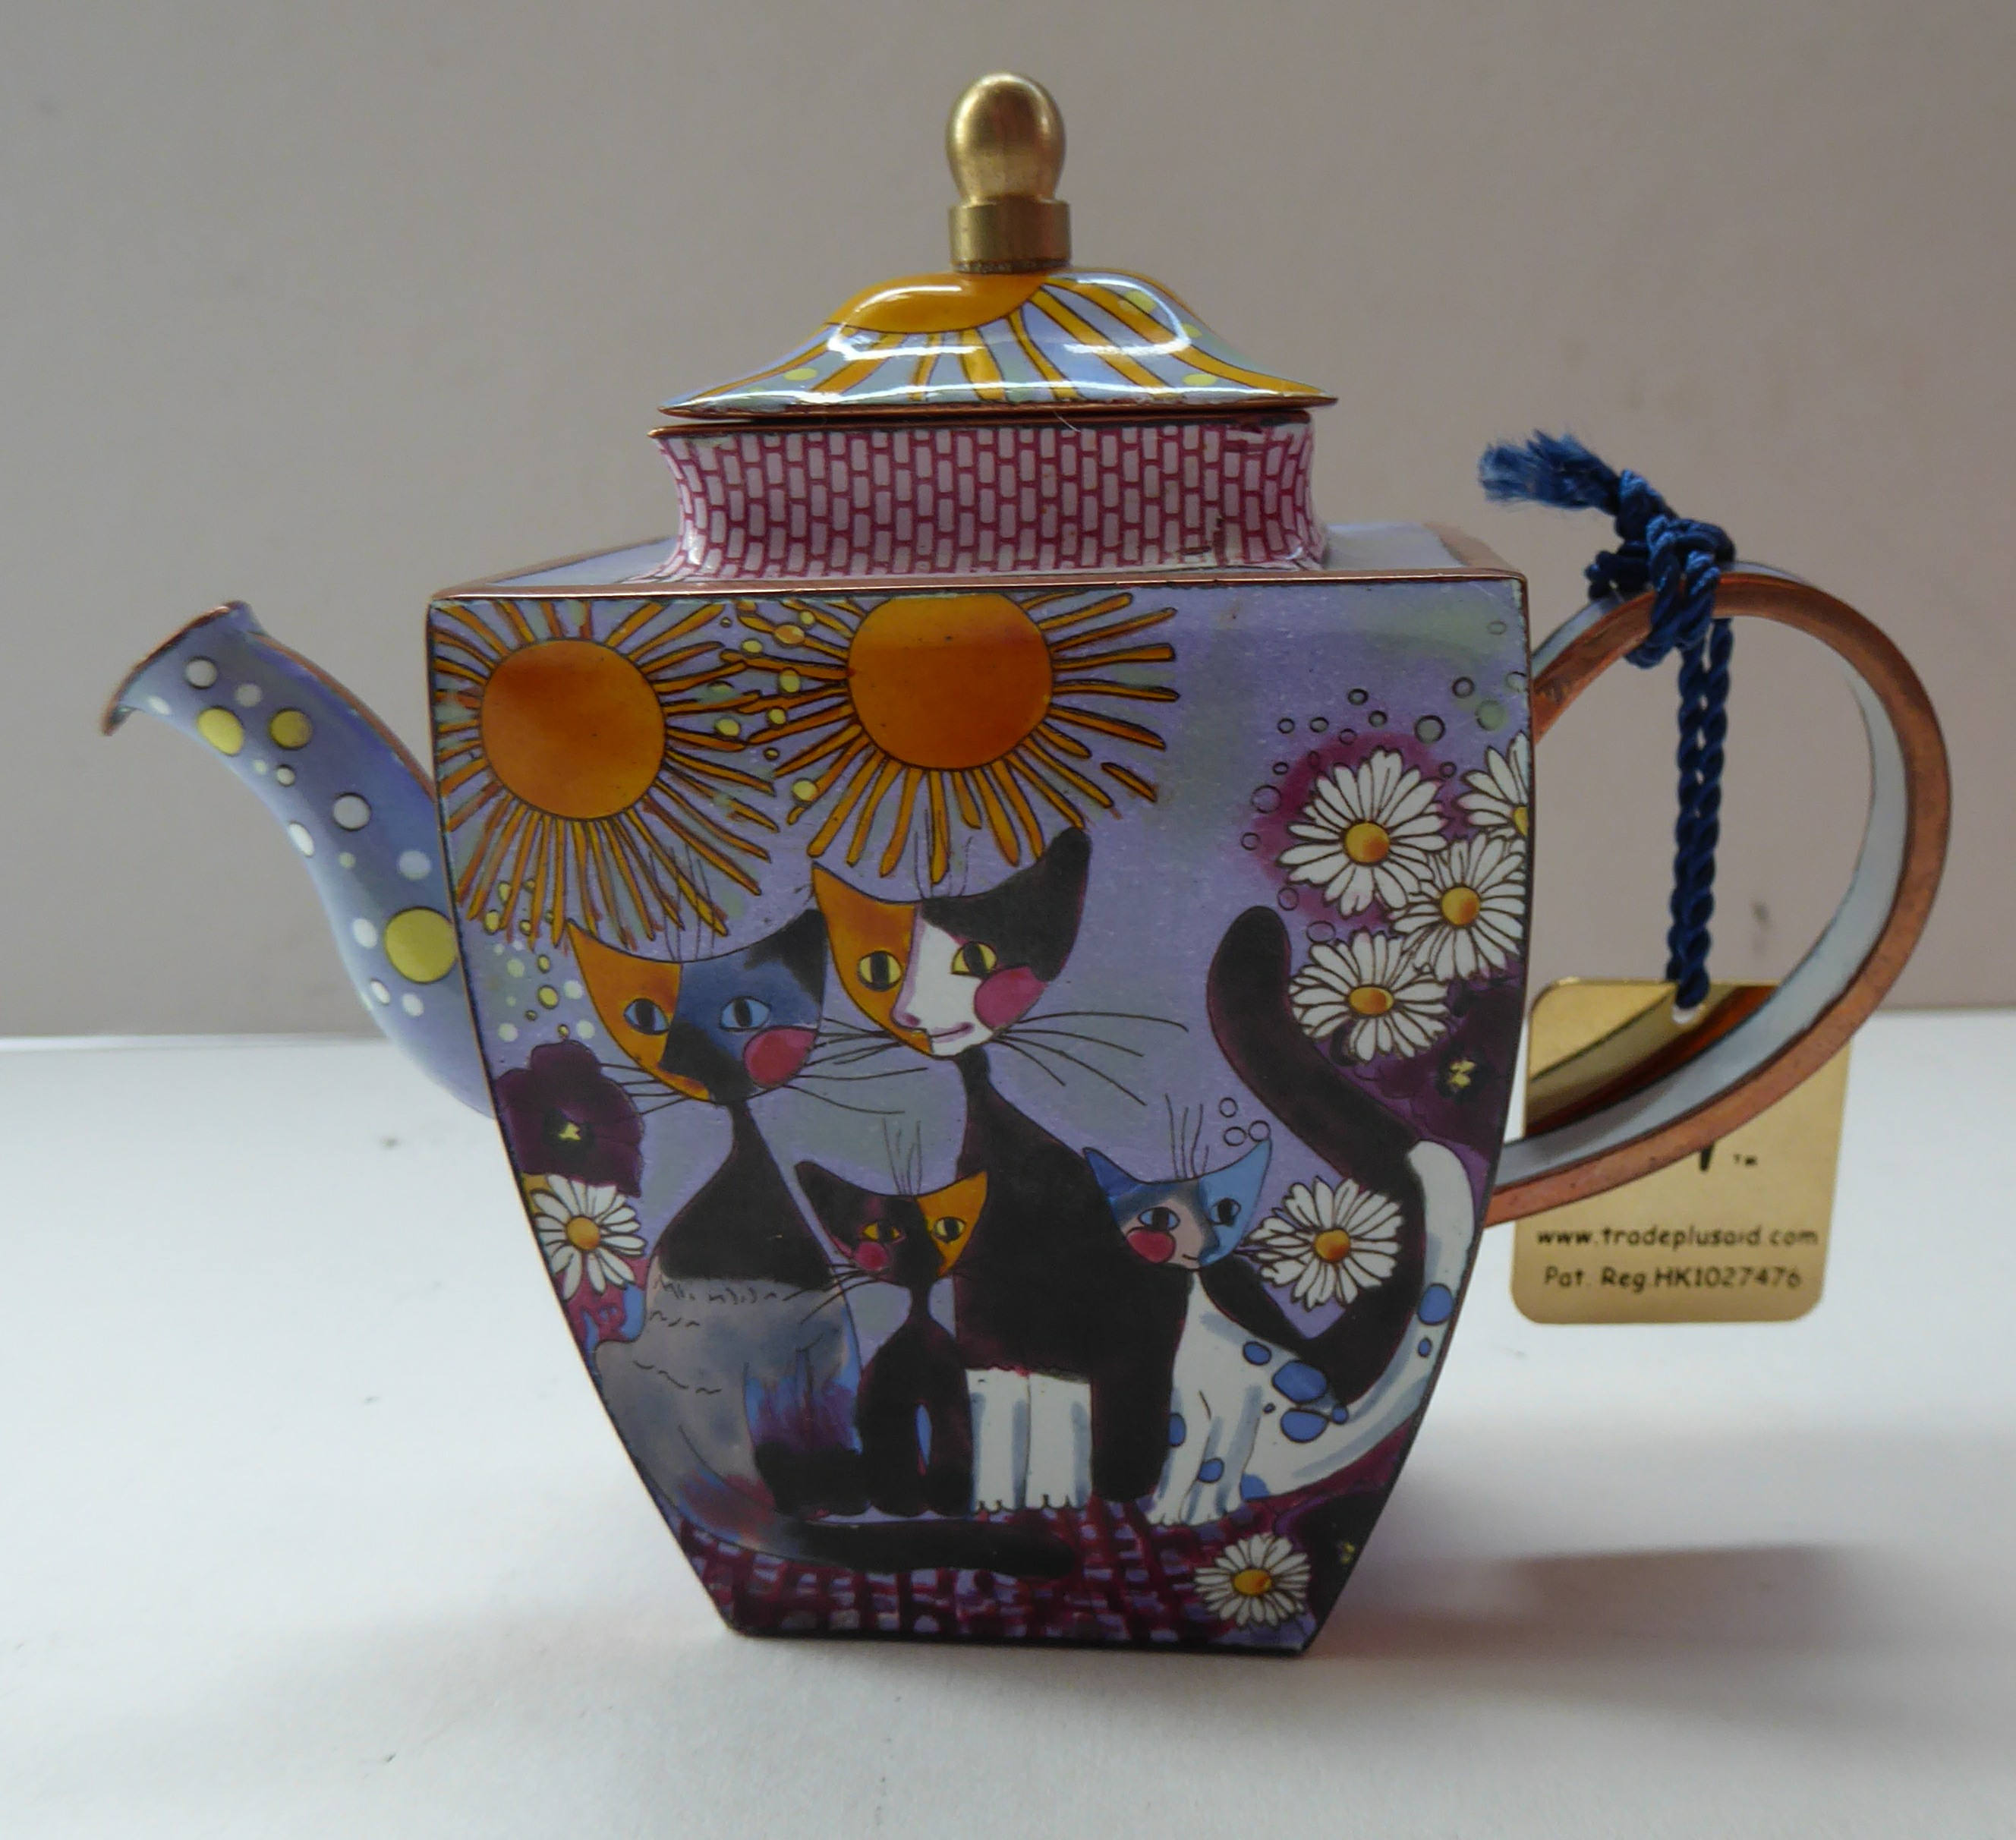 Collectable & Boxed Charlotte di Vita CAT FAMILY Enamel Teapot for